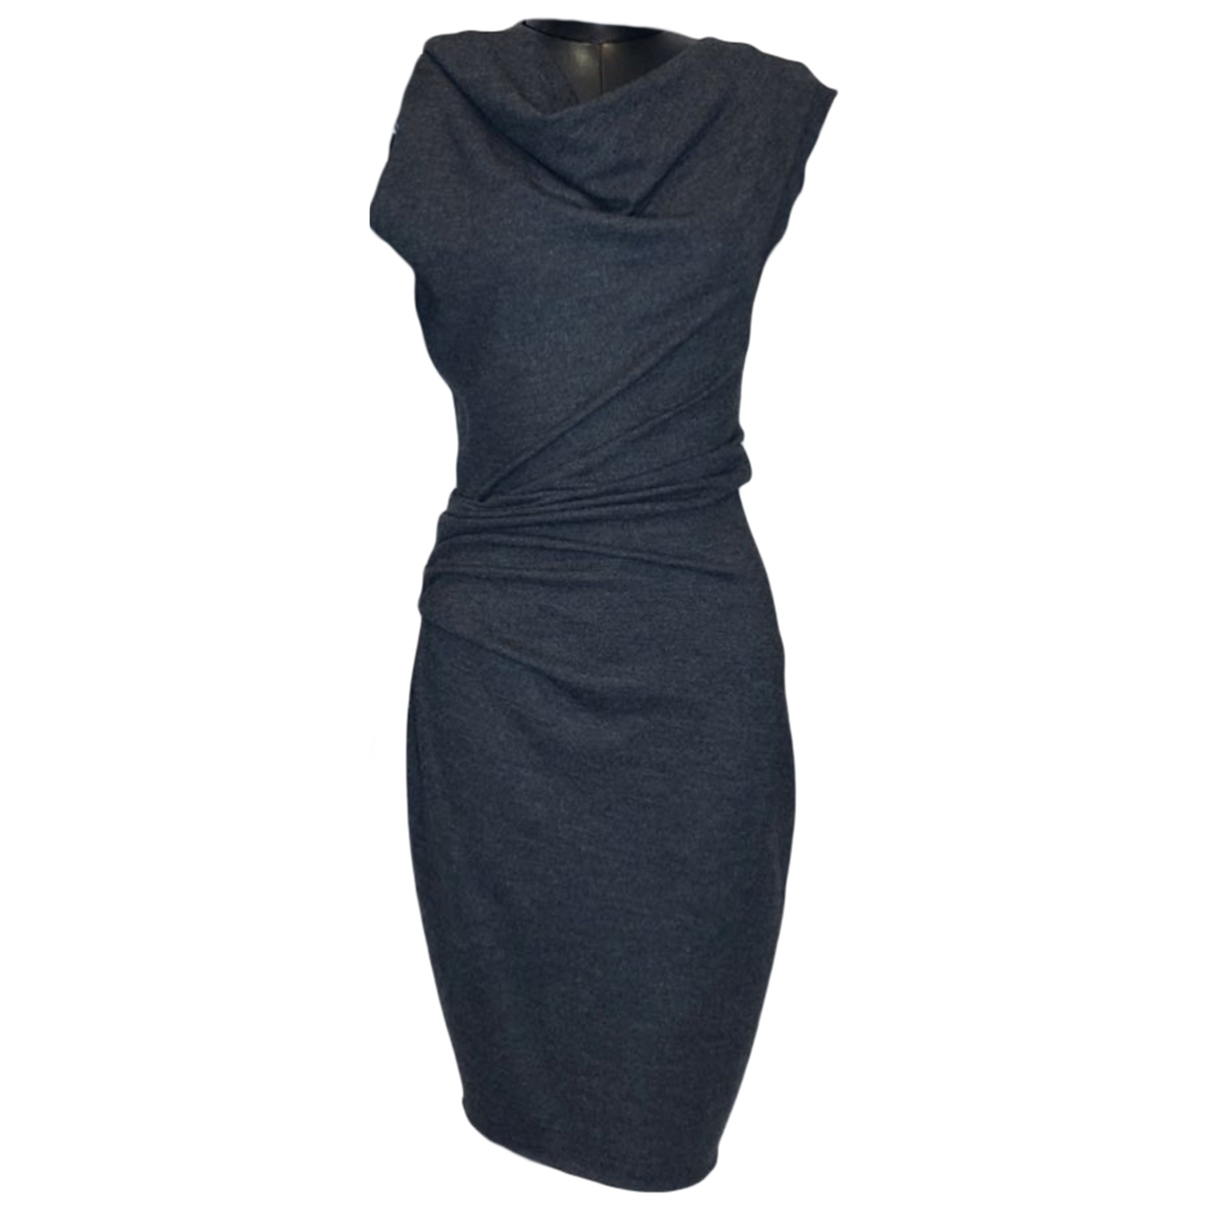 Helmut Lang \N Grey Wool dress for Women S International